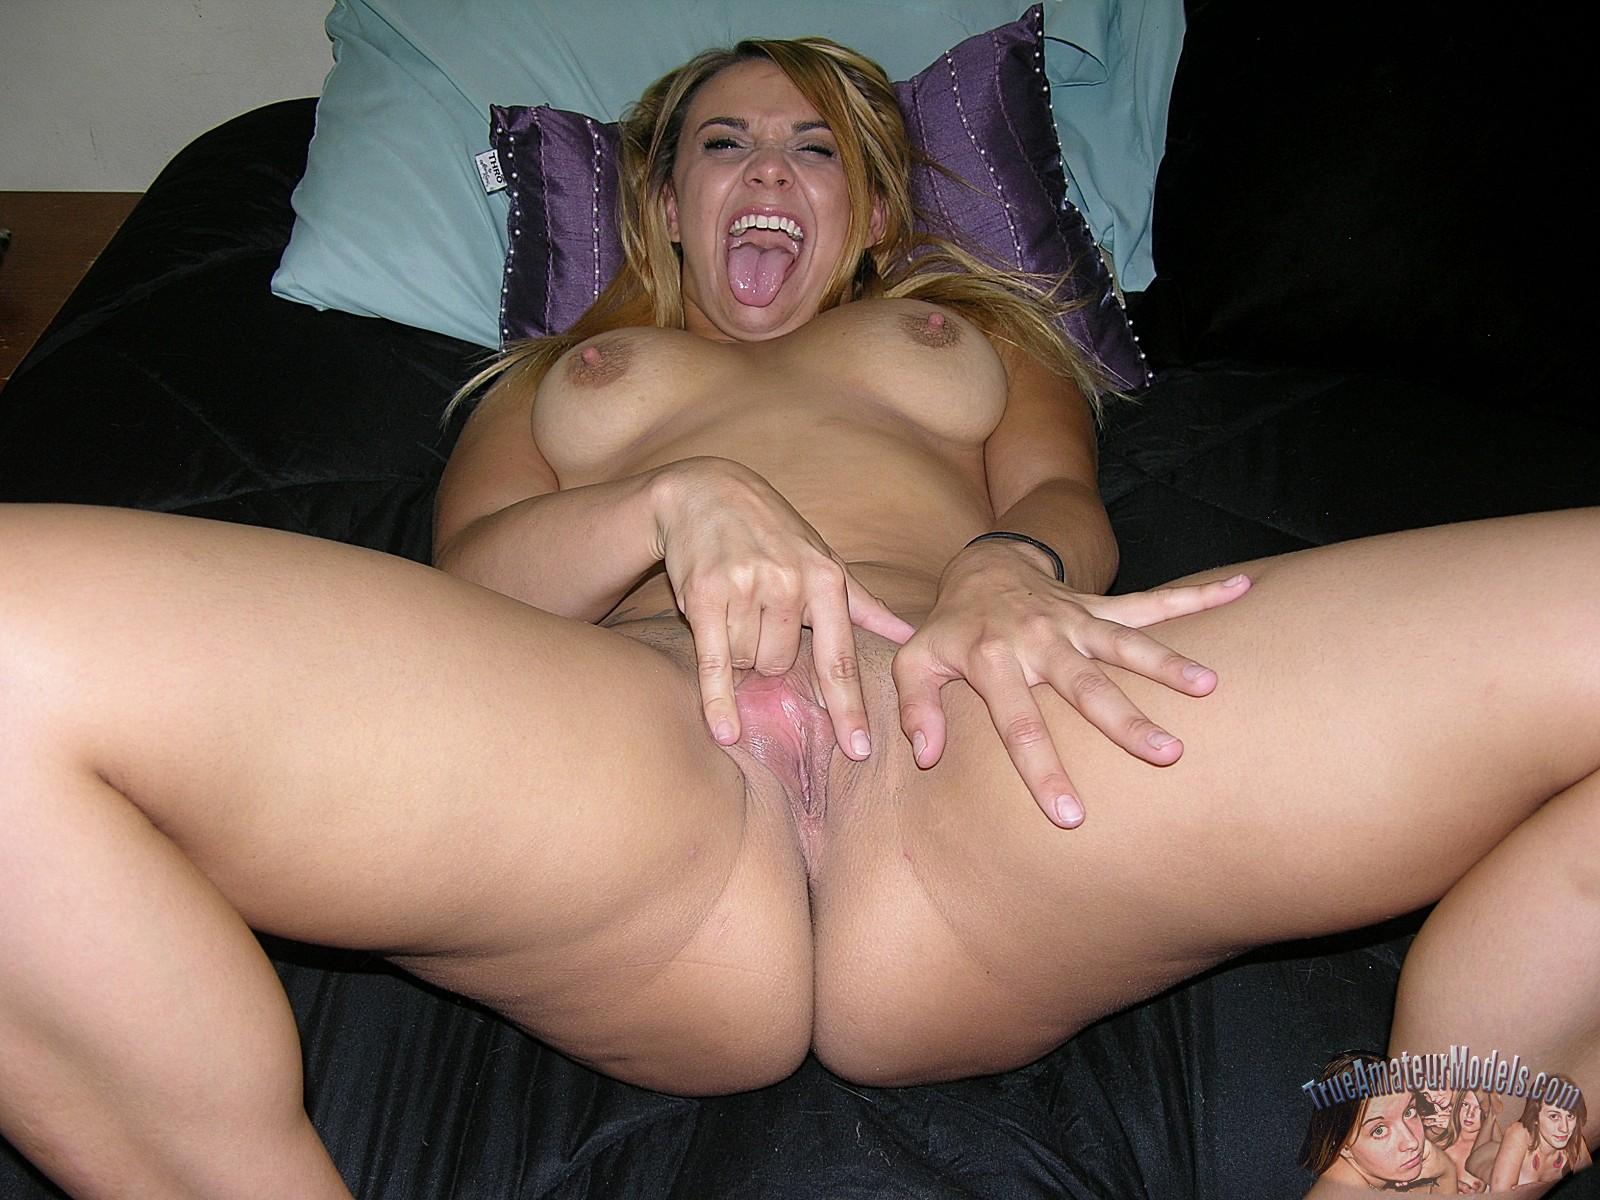 pantyhose free pantyhose porn sites